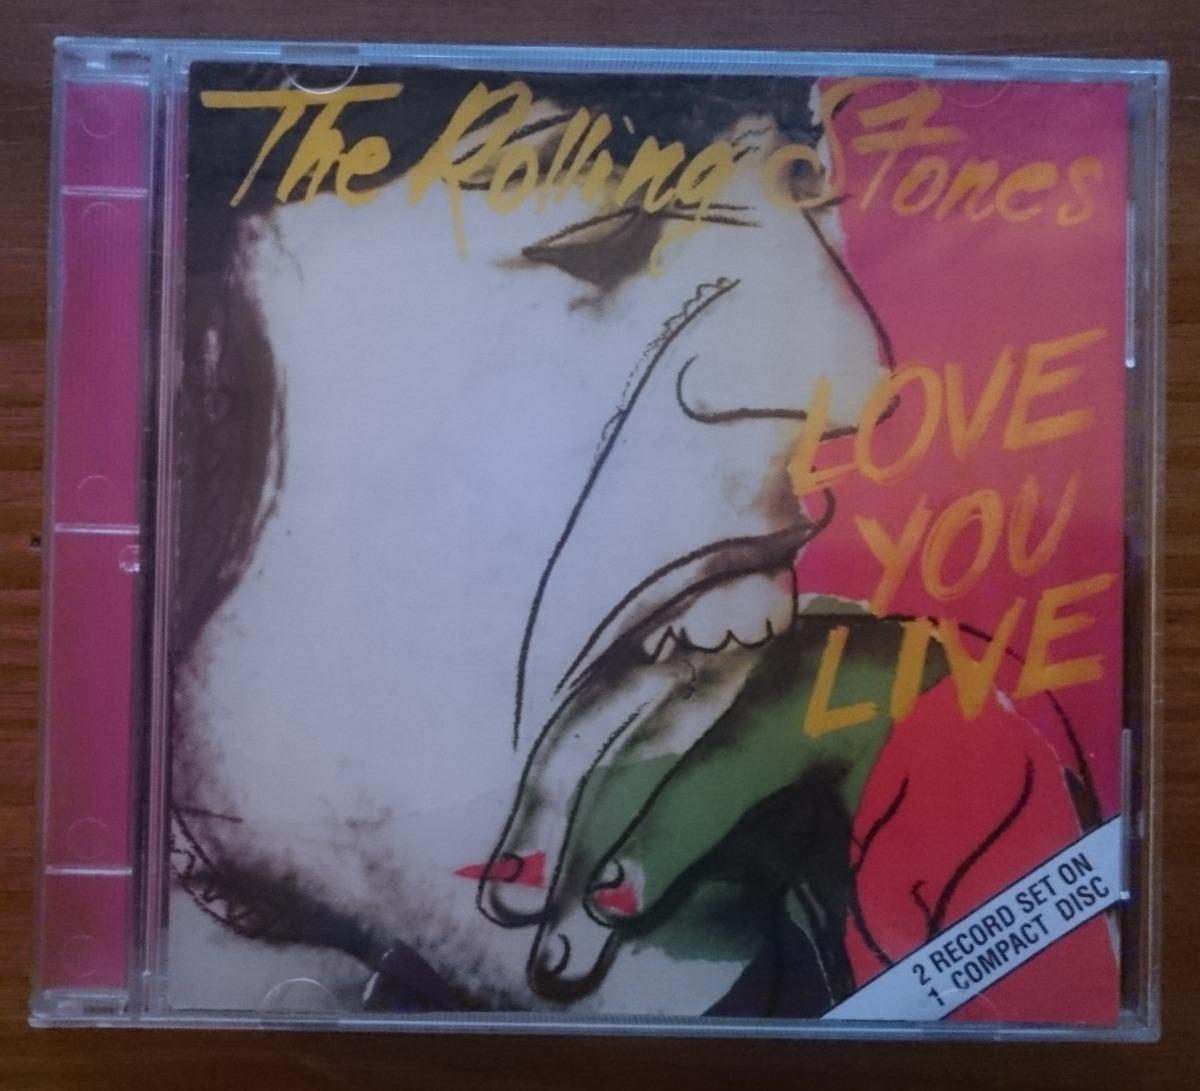 Cd The Rolling Stones - Bootleg Australia Love You Live